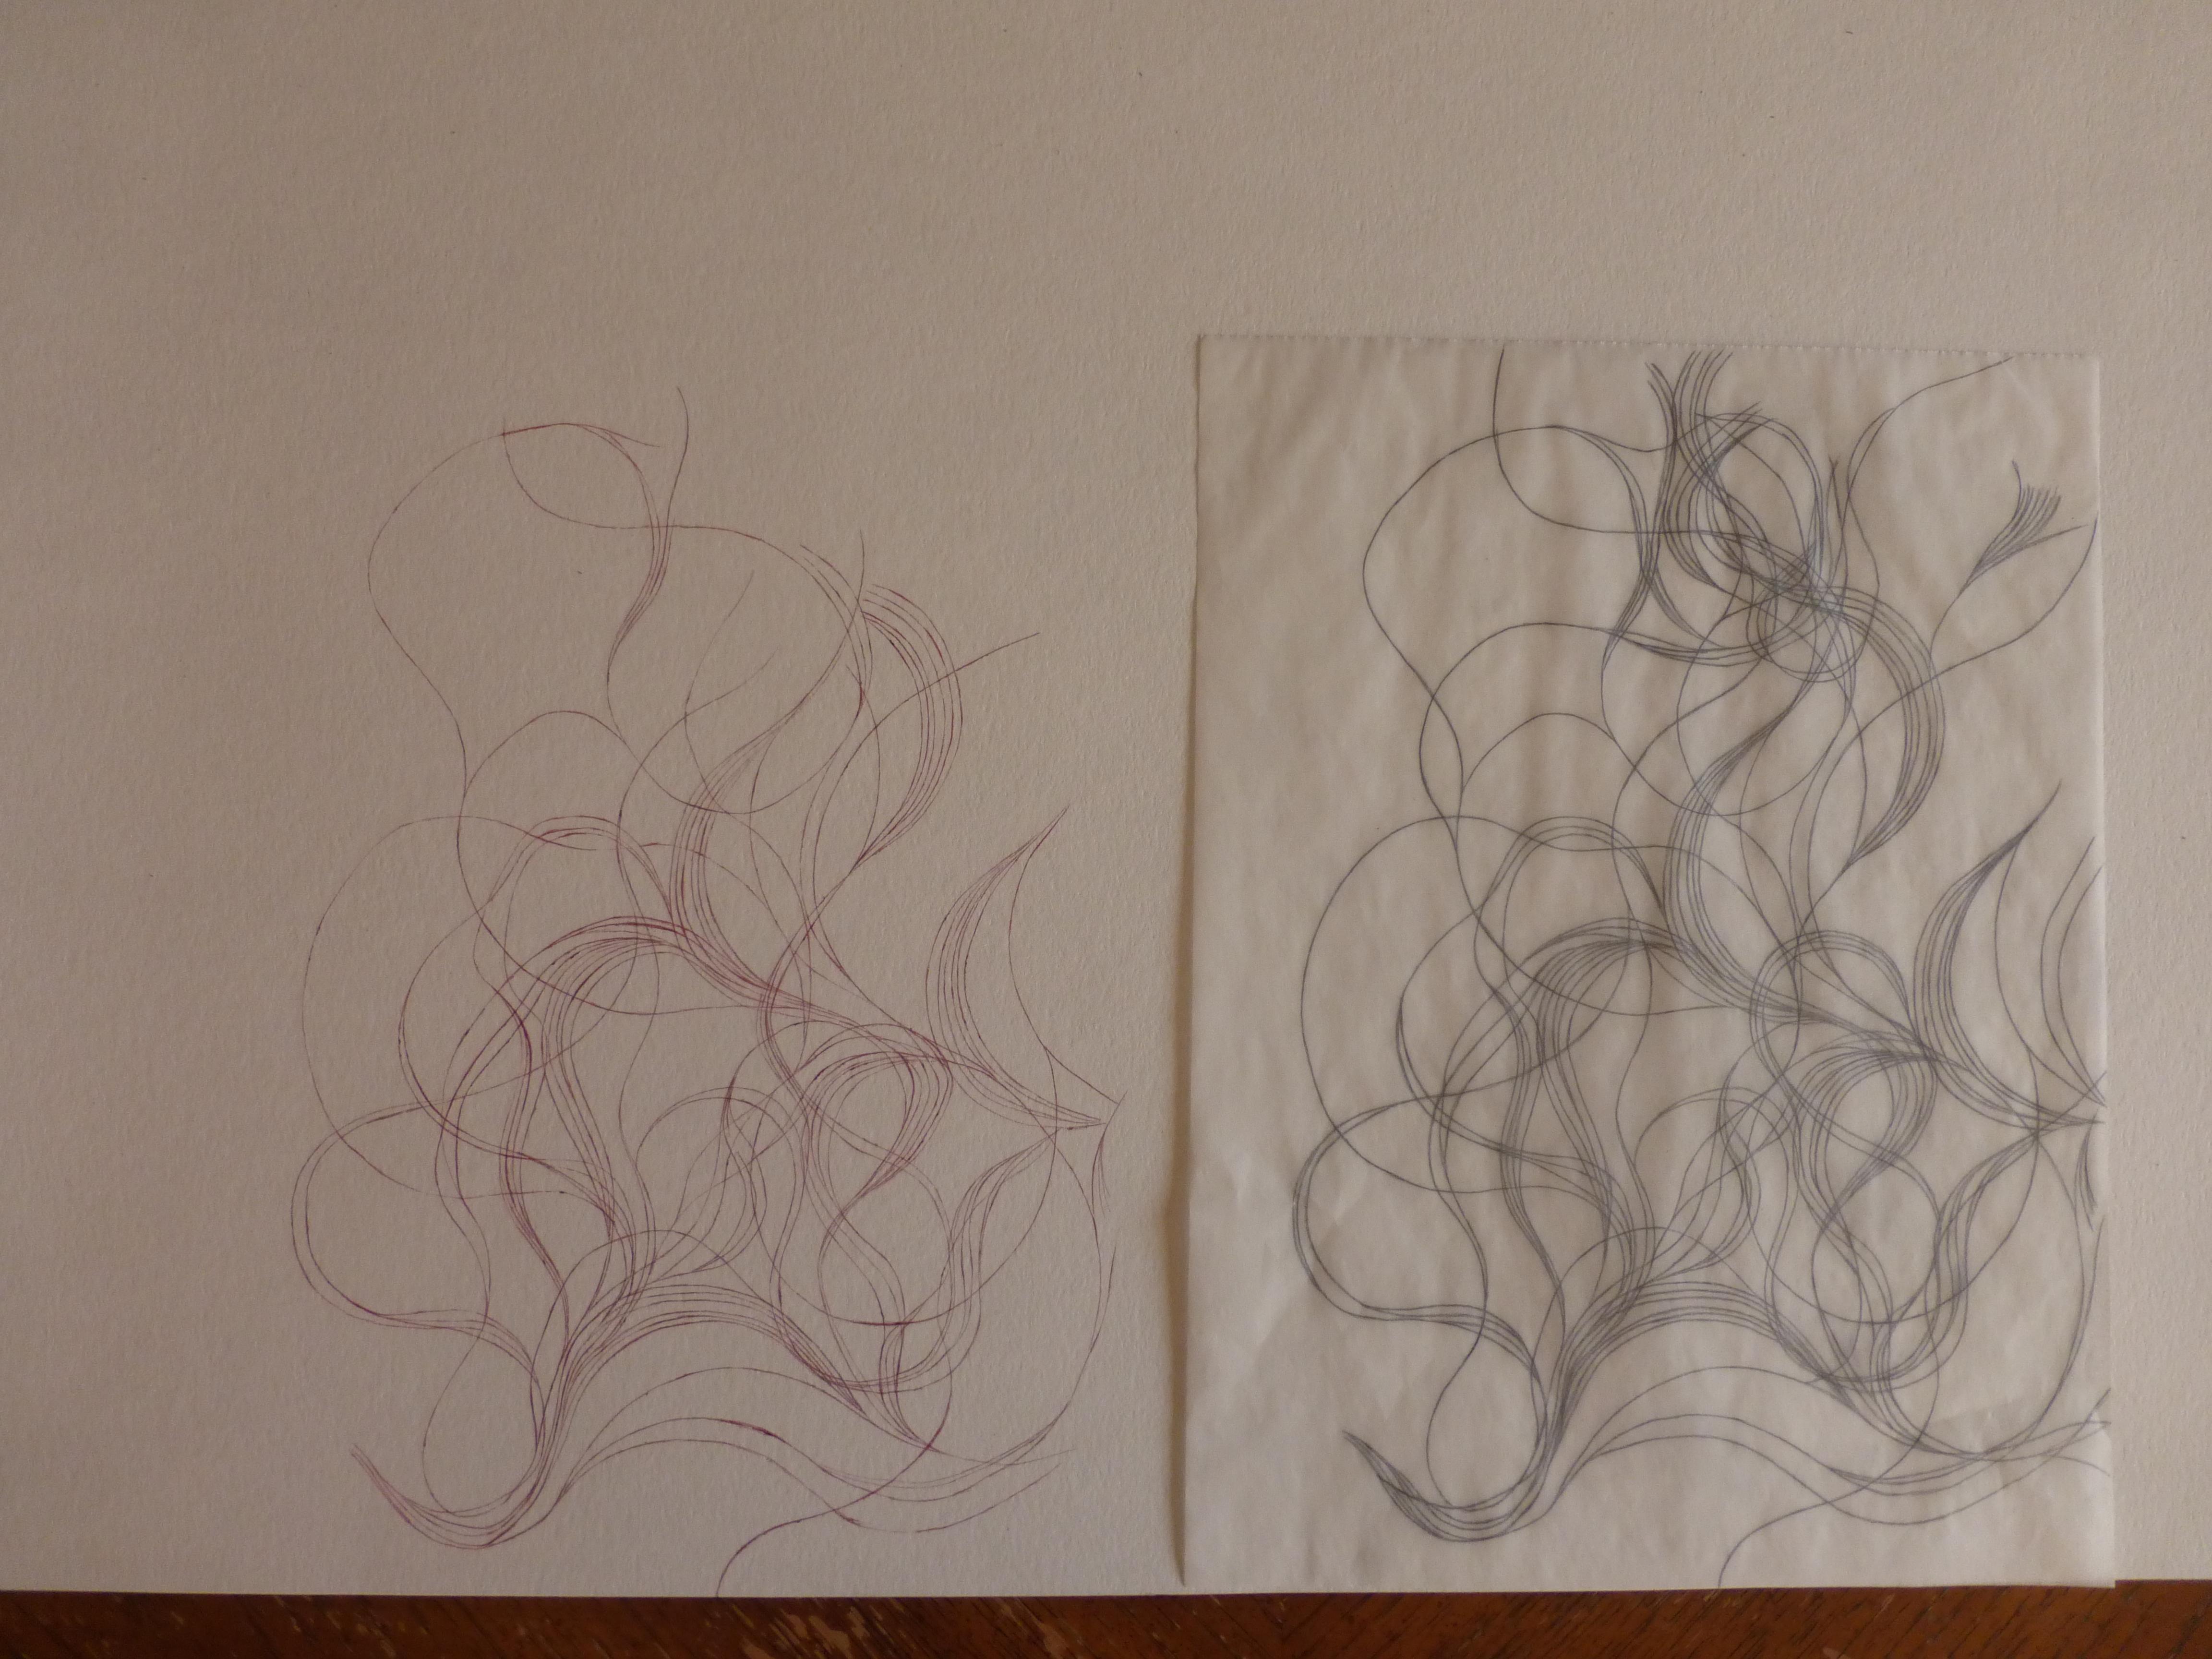 Gaa Wai (dot) com, Solar Flare, edit 1, sketch (6)